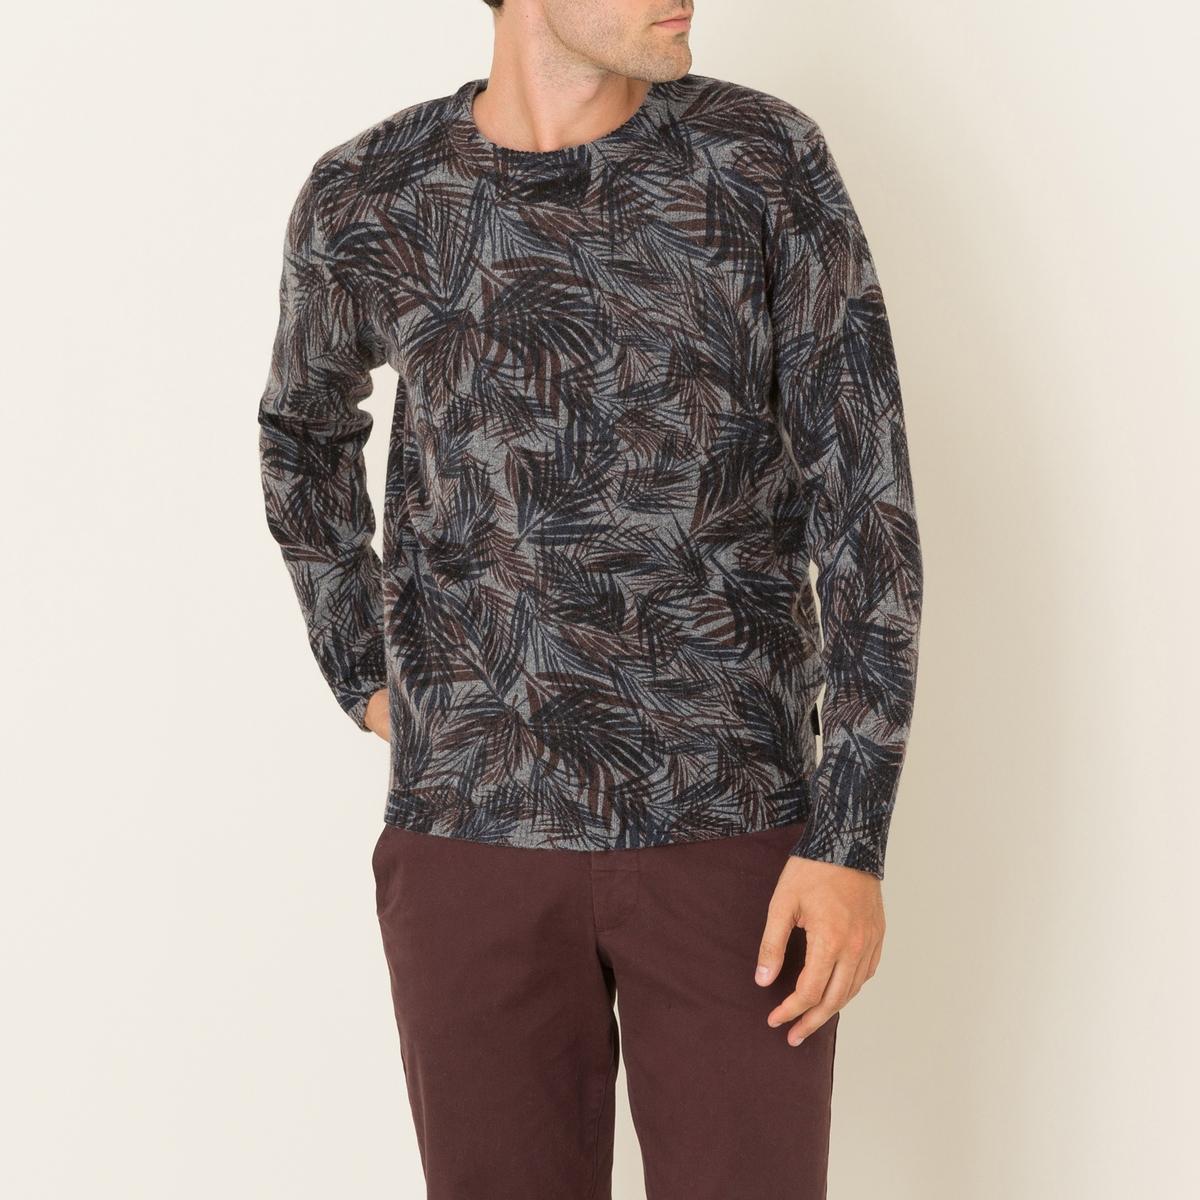 Пуловер SHOGUN от La Redoute